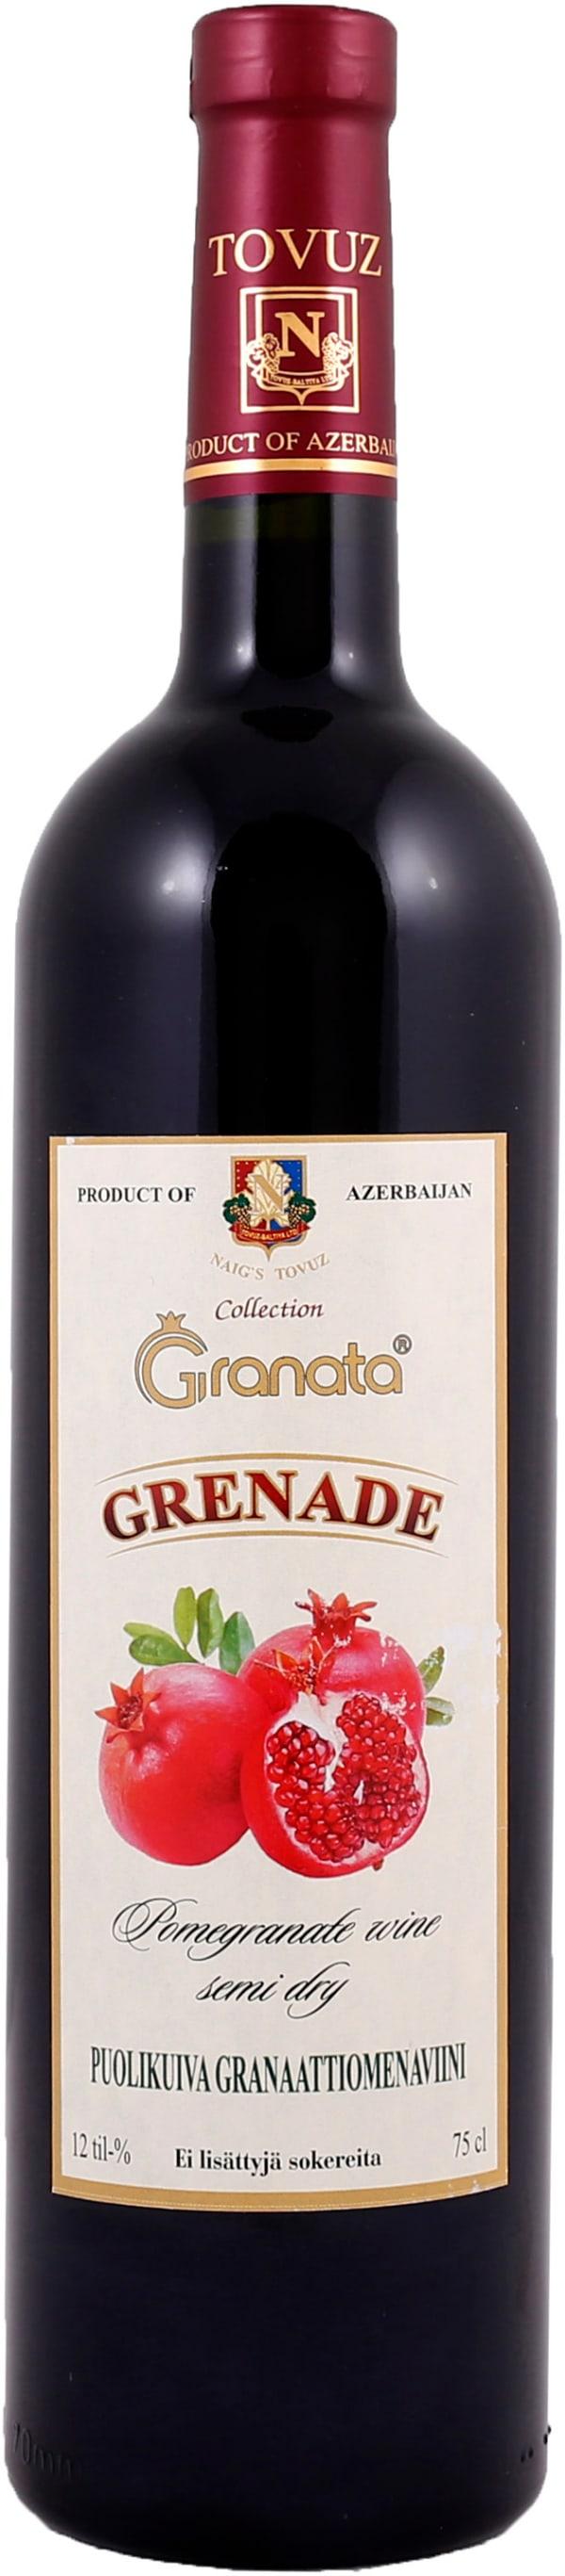 Grenade Wine Semi-Dry Puolikuiva Granaattiomenaviini